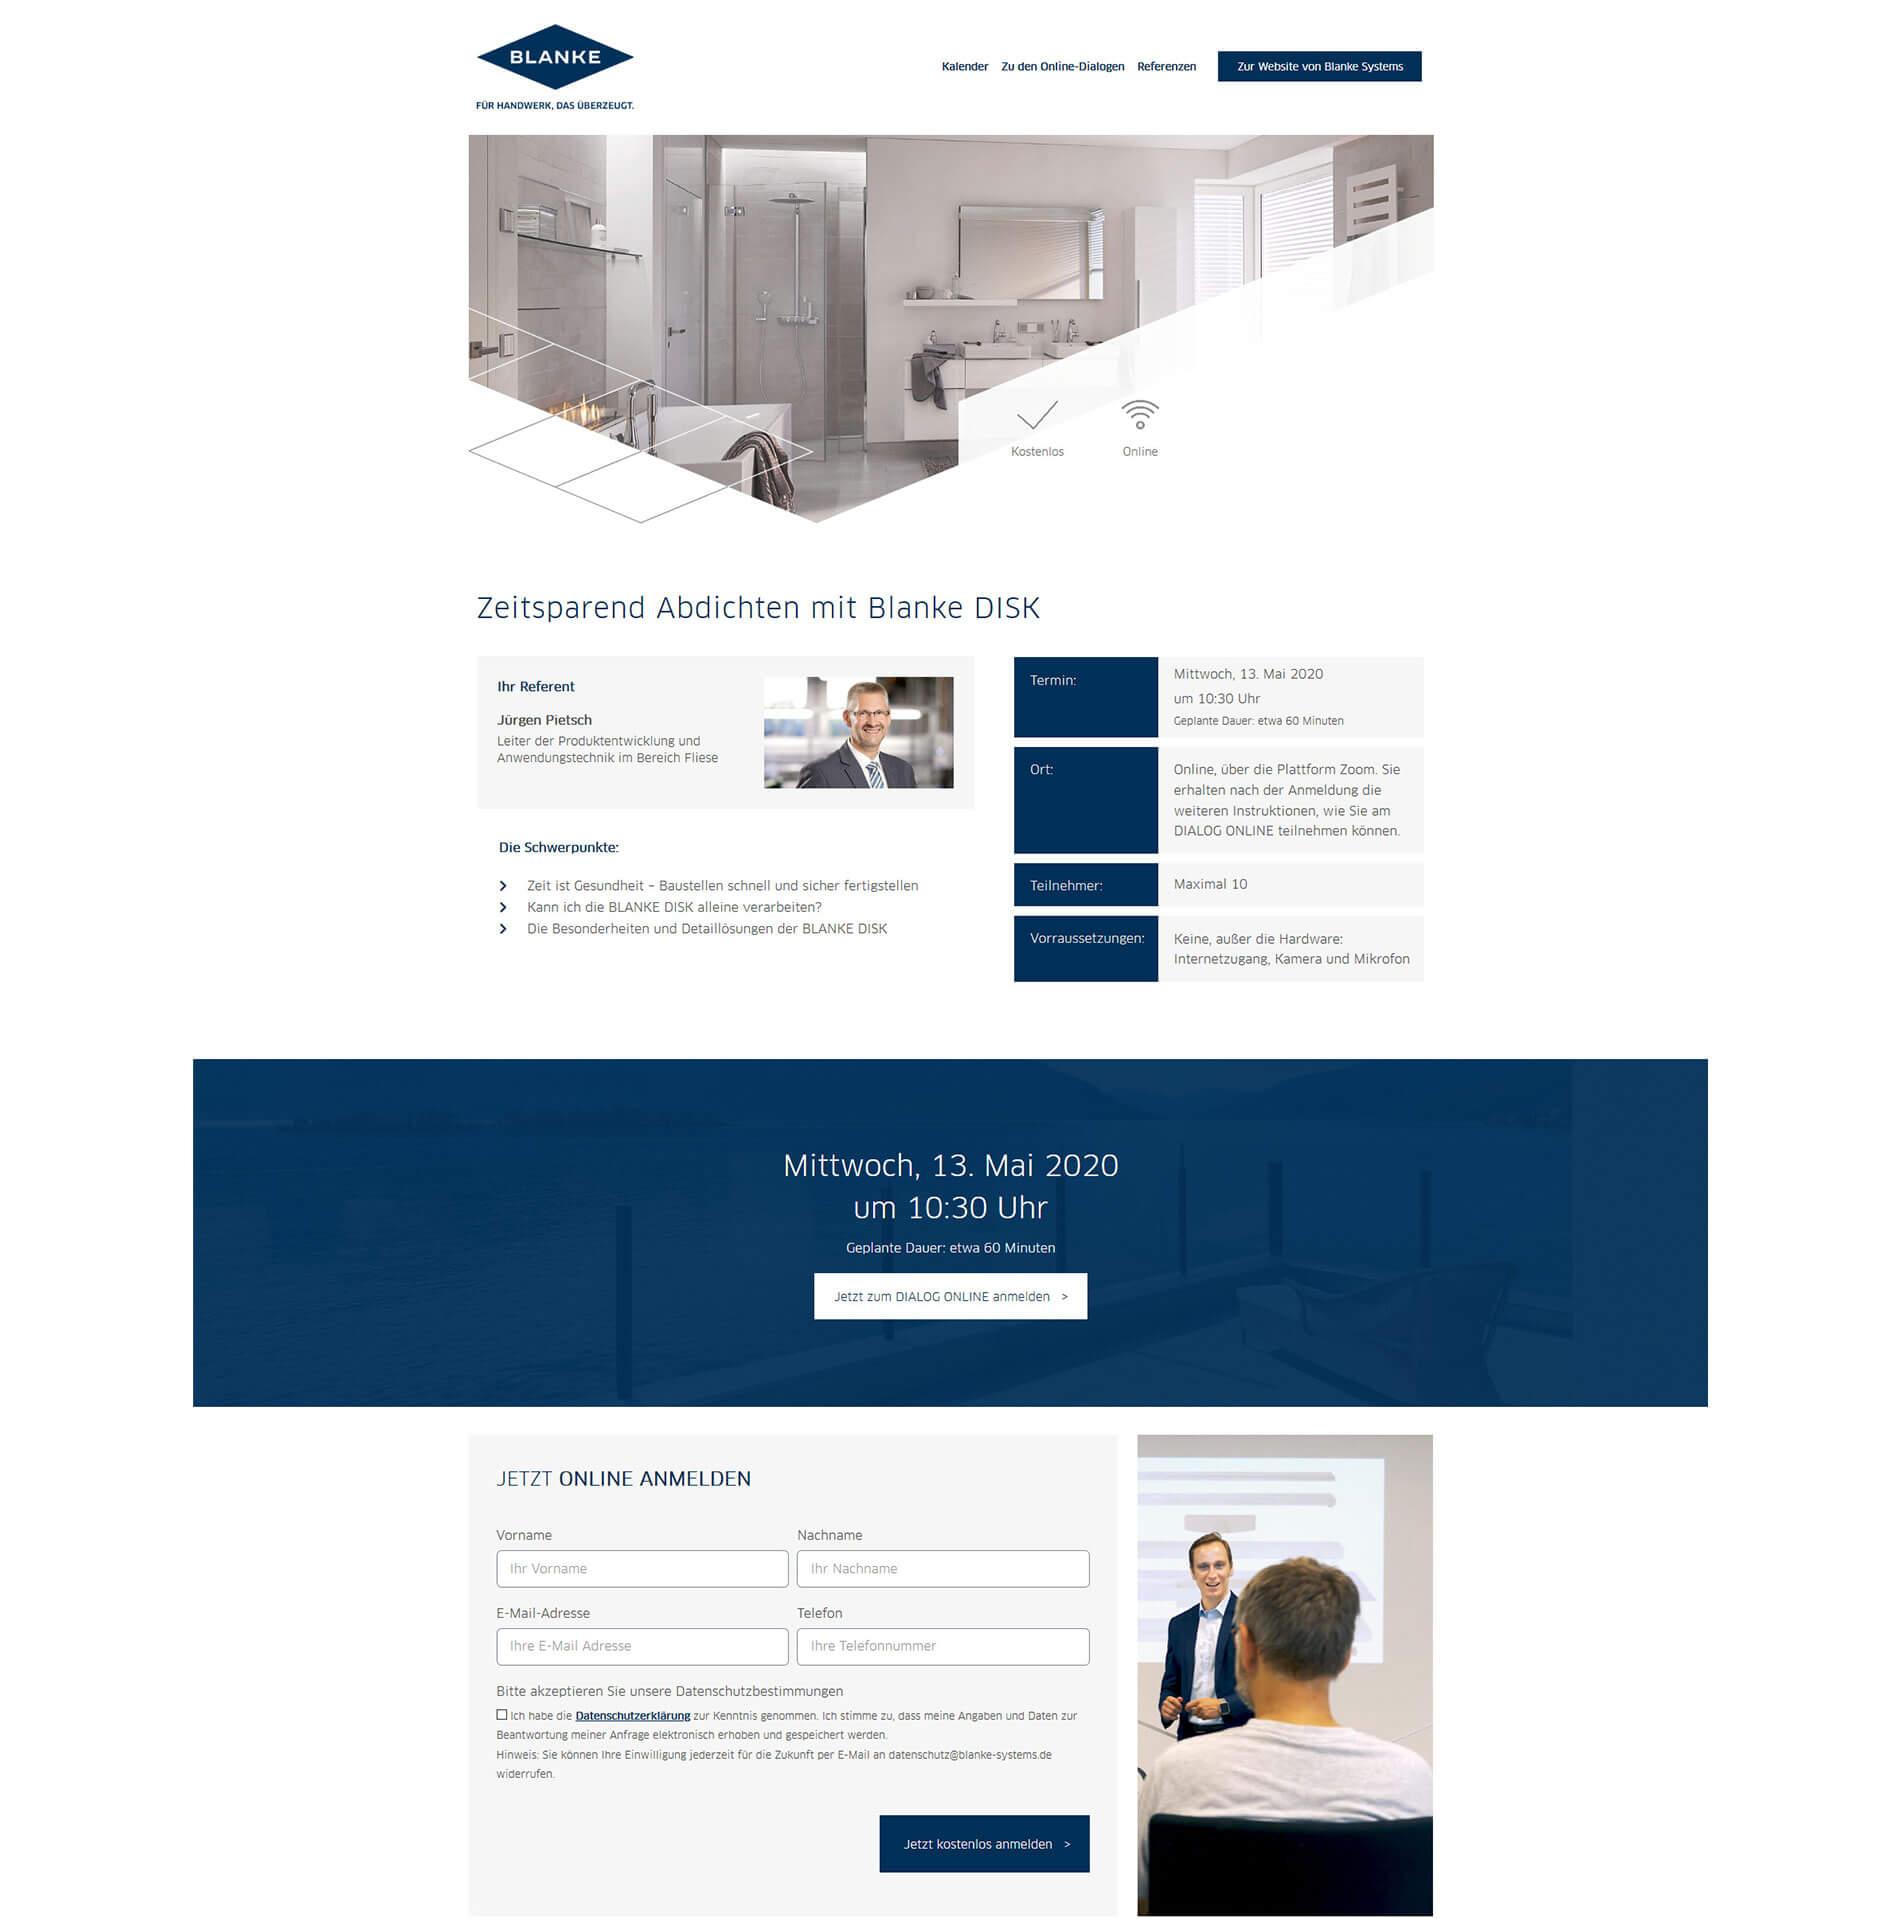 webinarverwaltung_terminseite